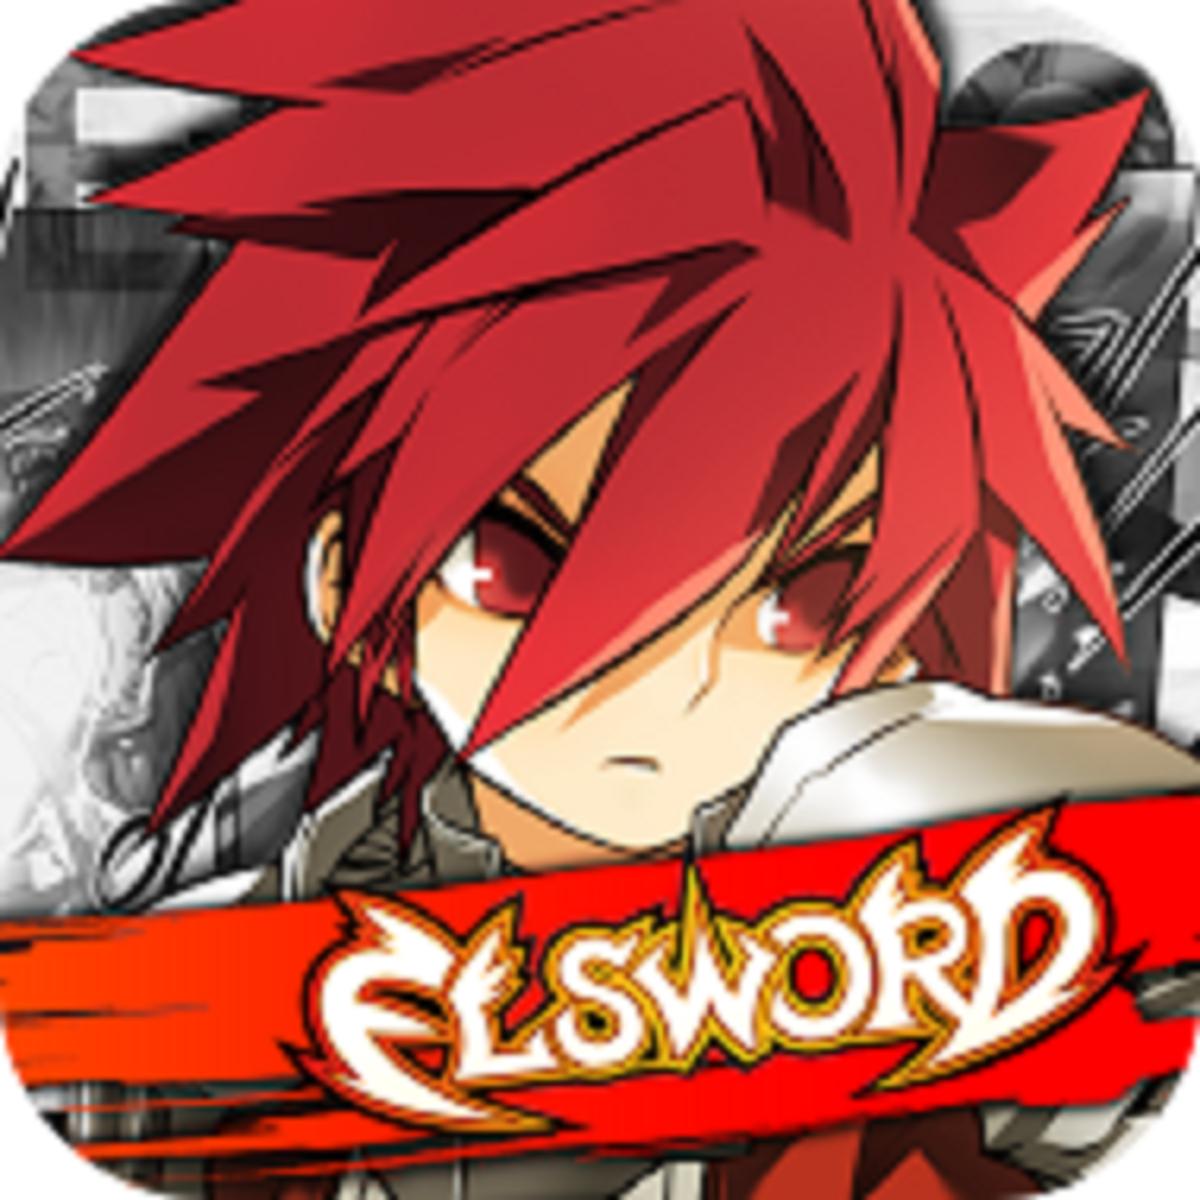 Elsword: Evolution Review - Bringing MMO to Mobile